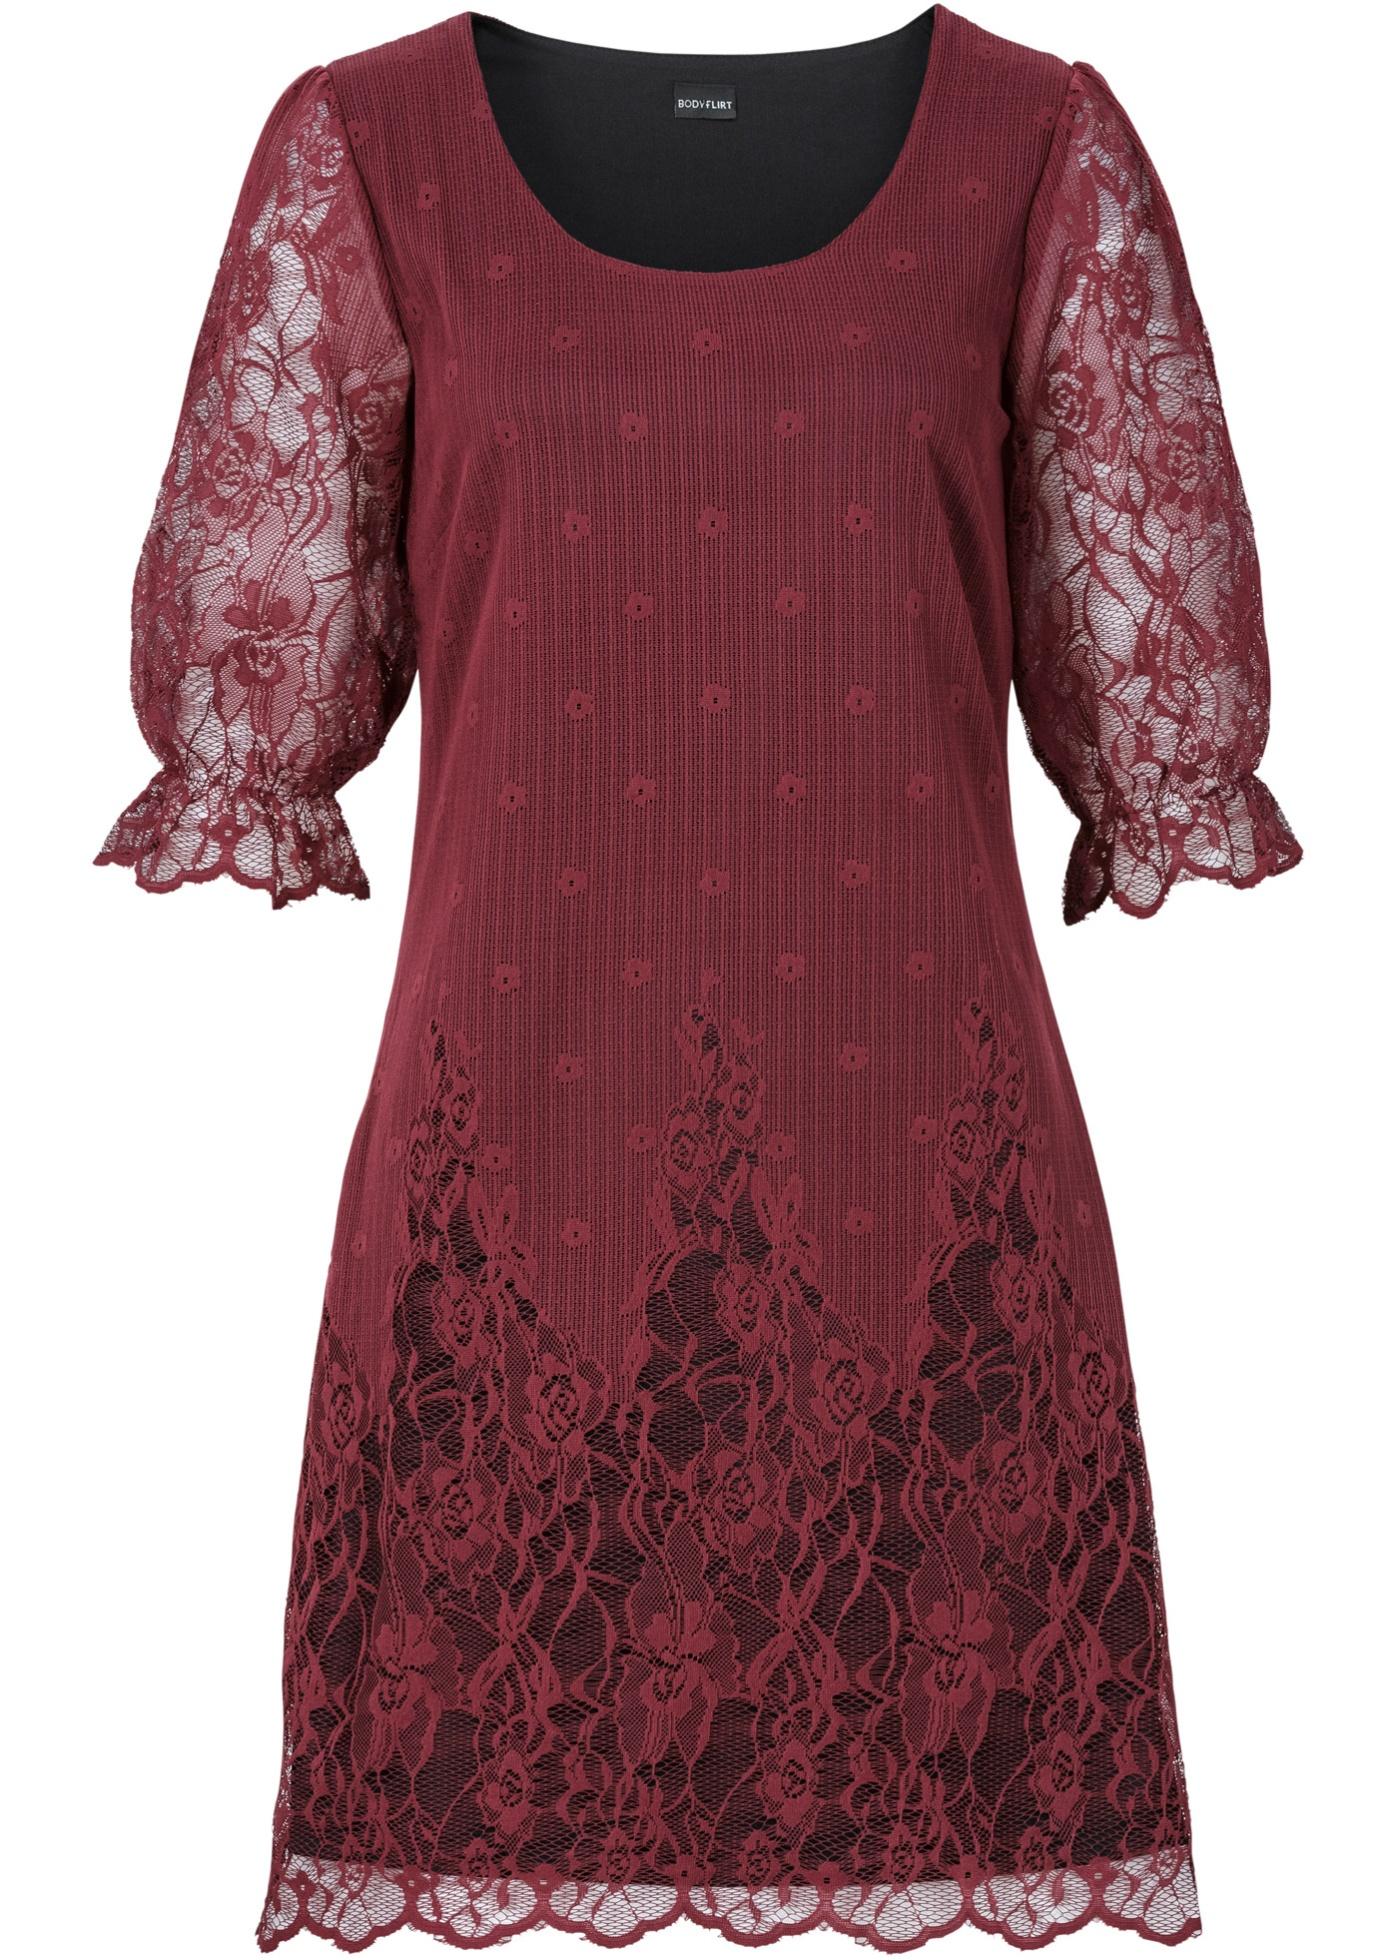 Robe courte rouge manches mi-longues femme -...